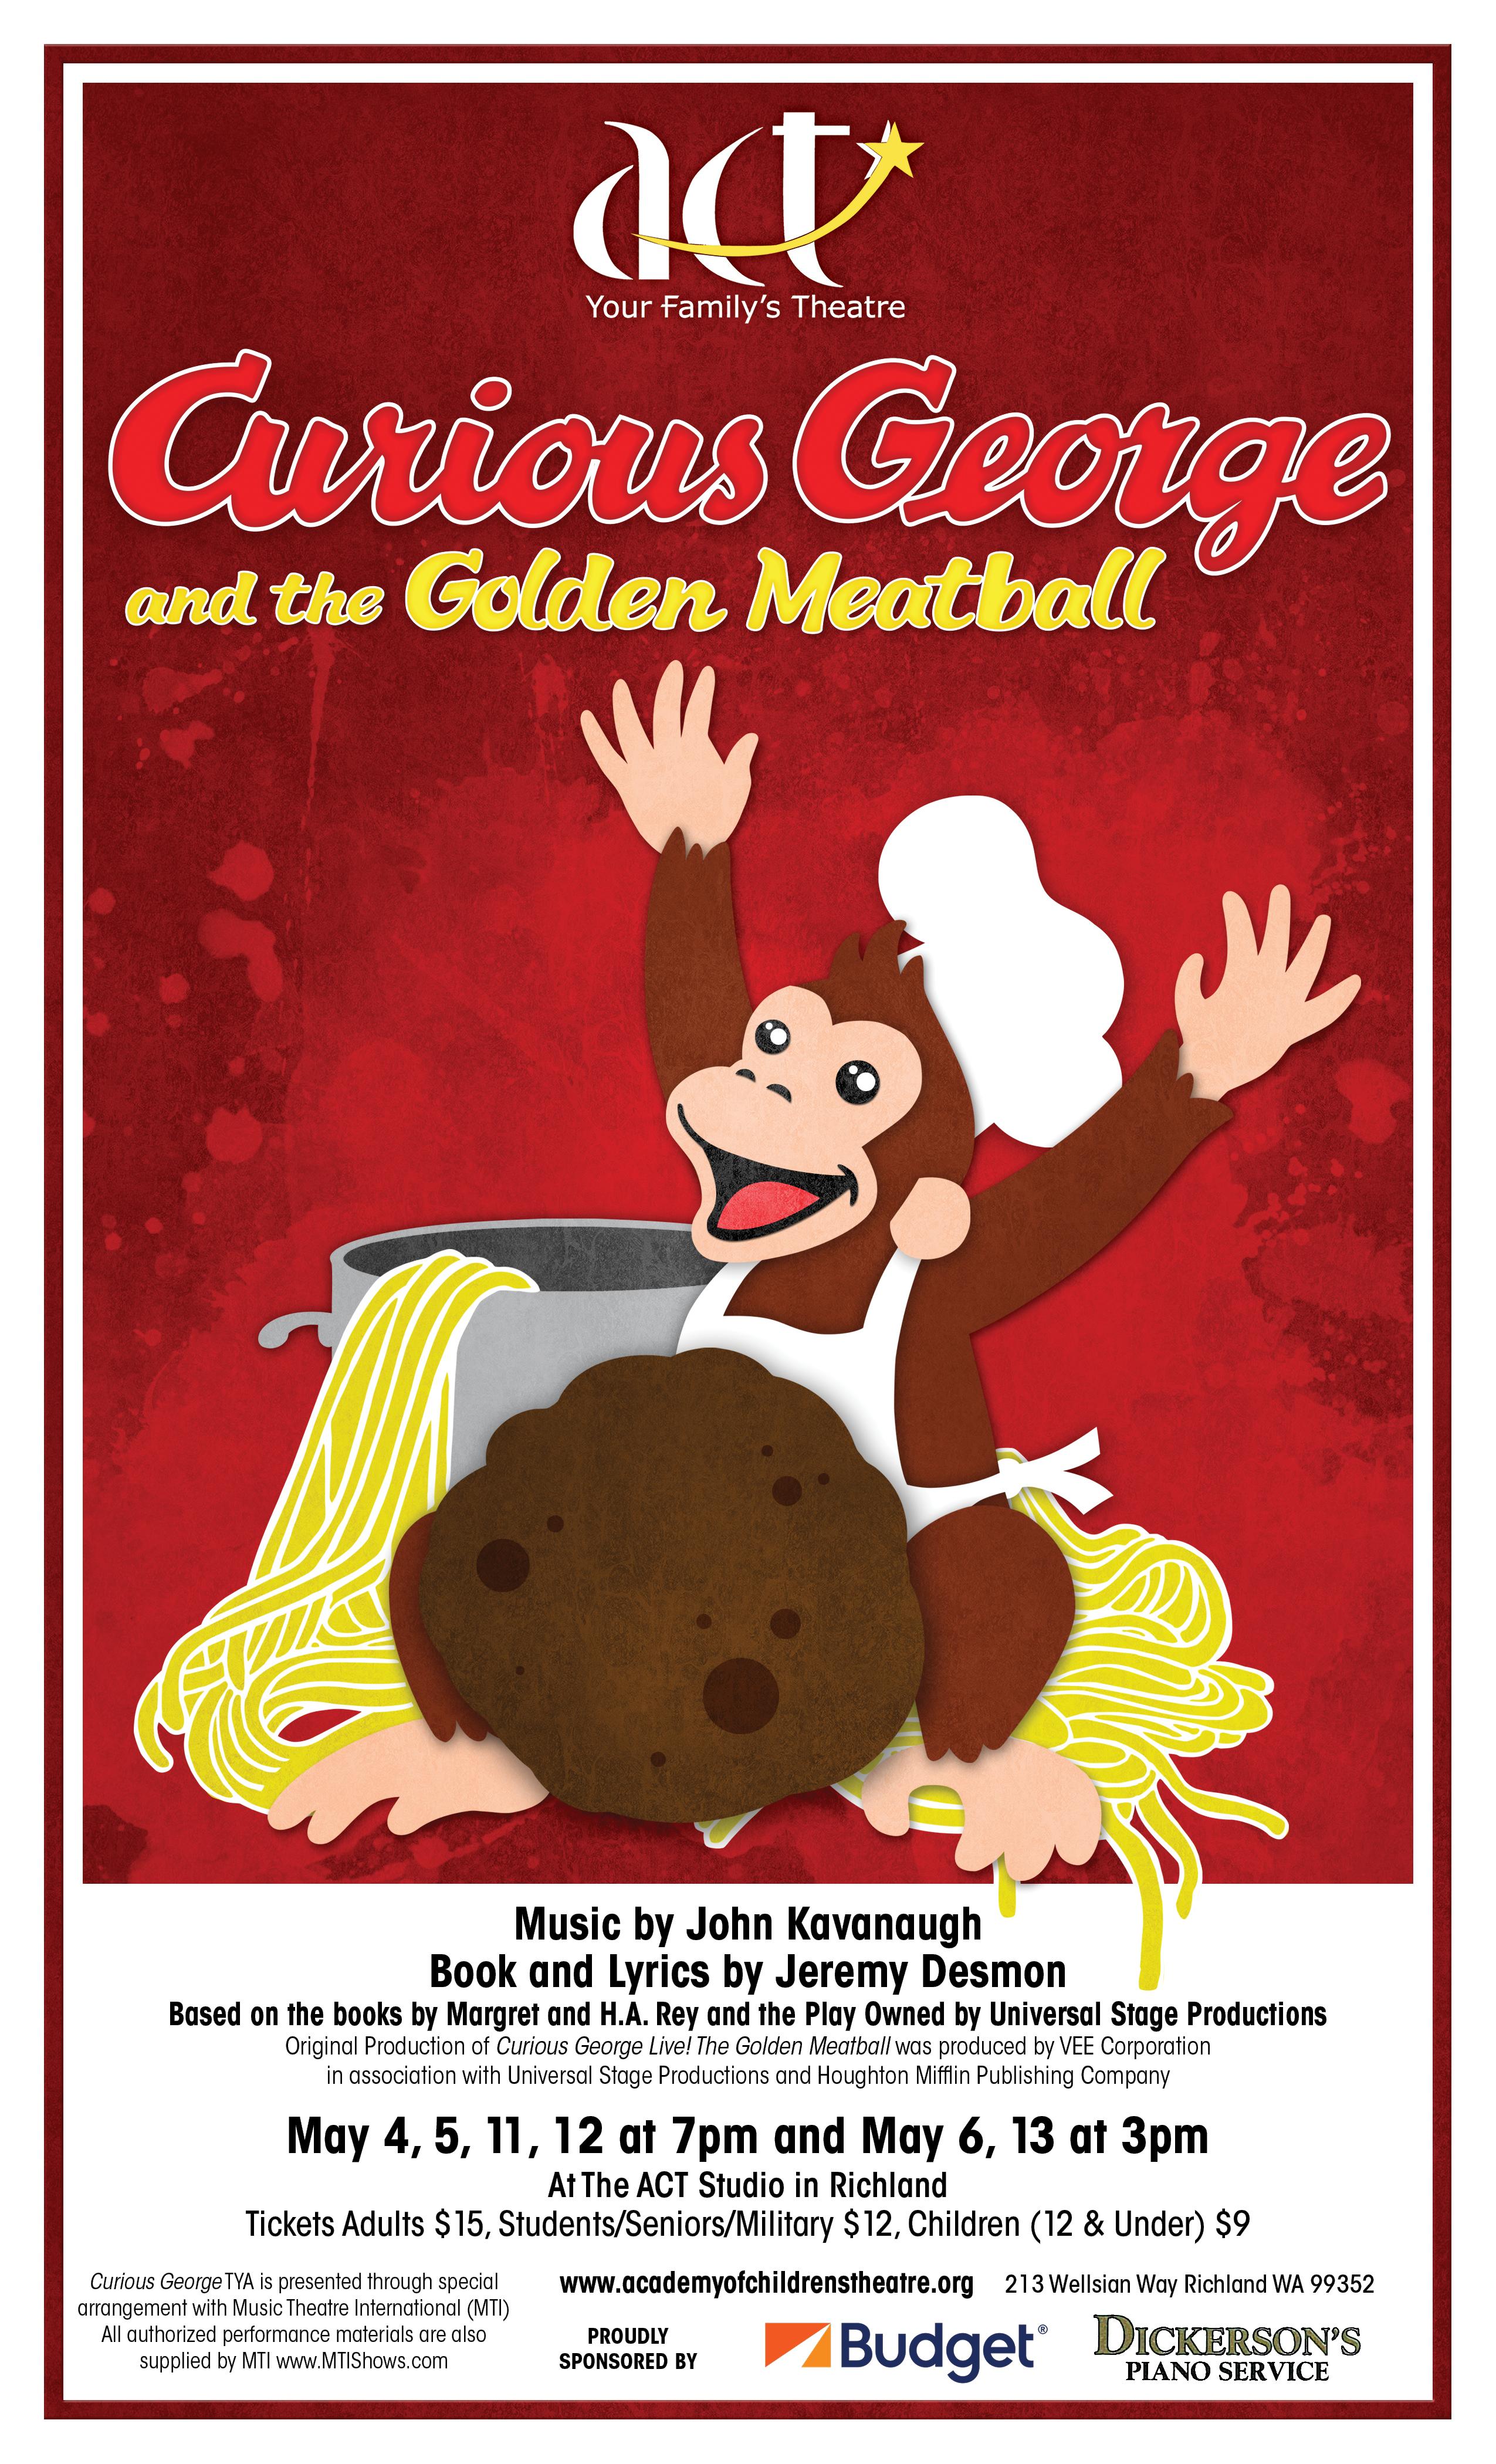 curious george and the golden meatball cast list - A Golden Christmas Cast